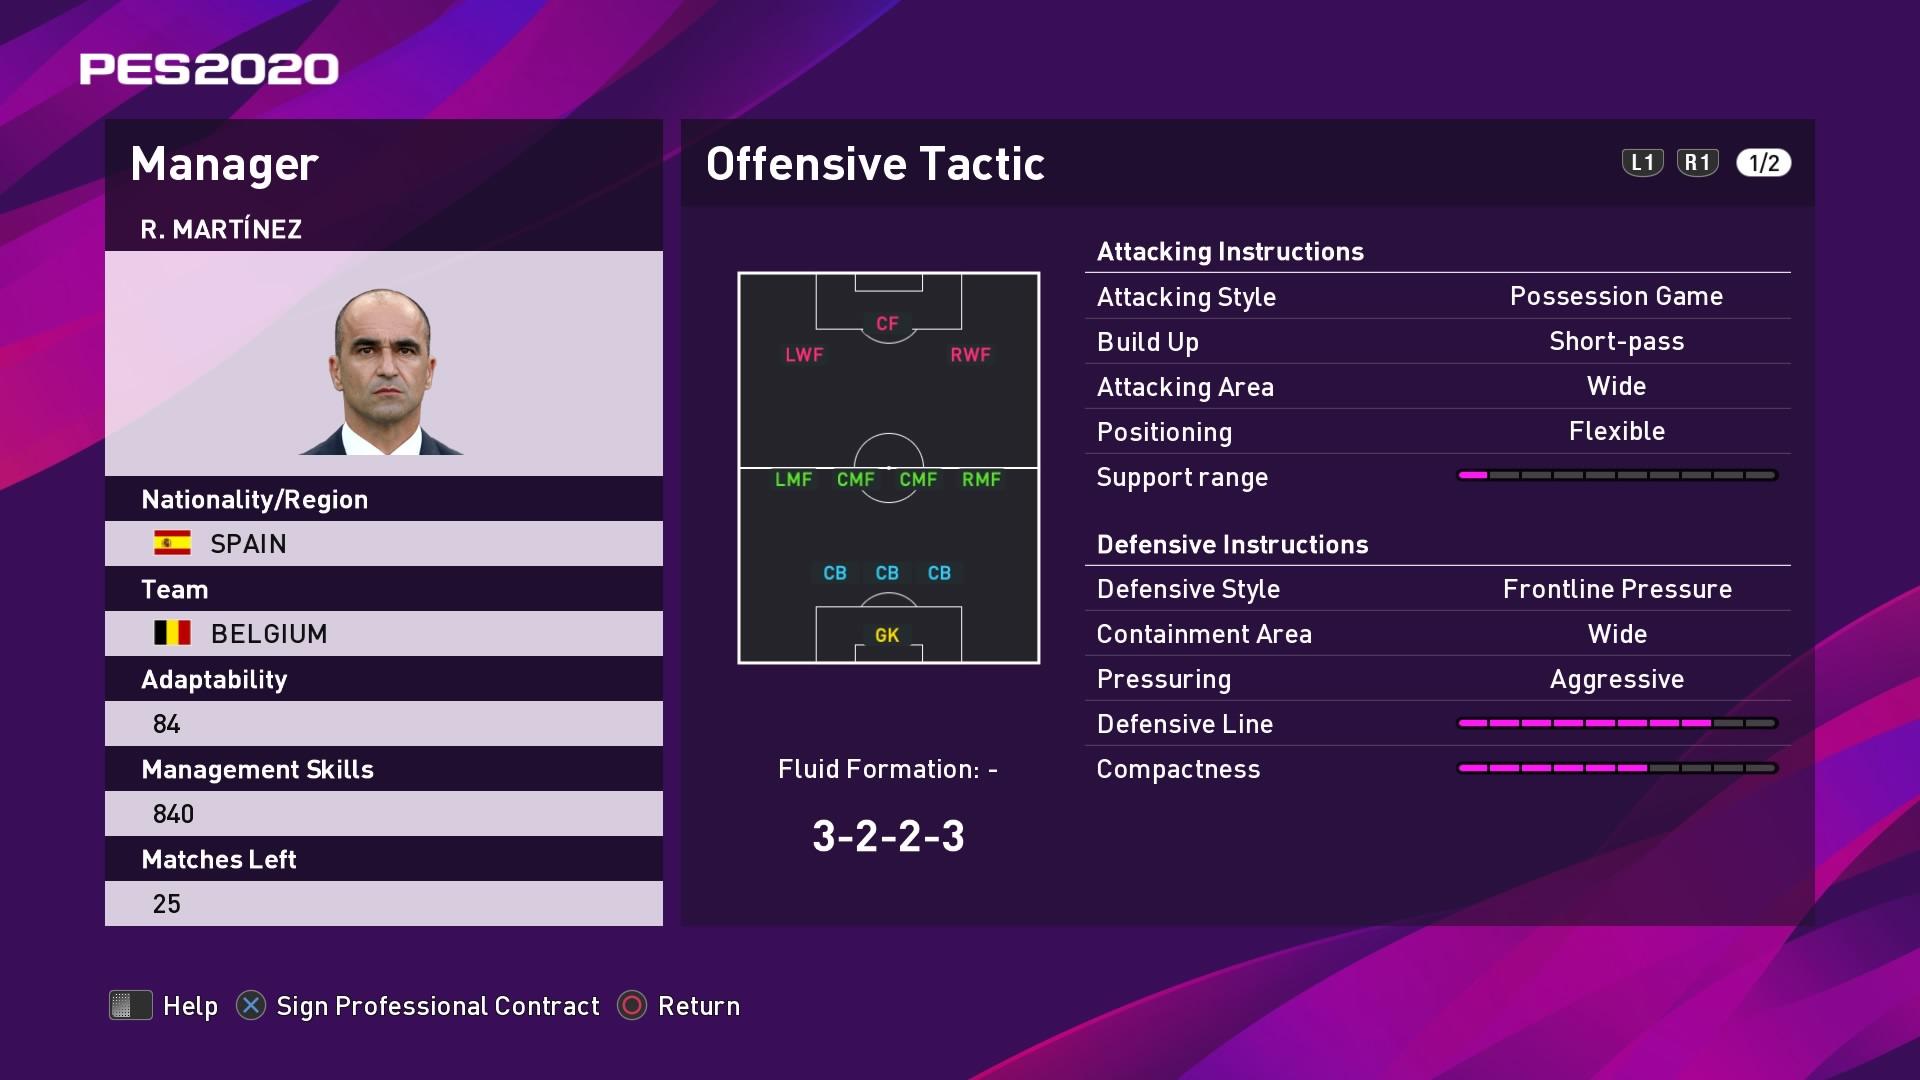 R. Martínez (2) (Roberto Martínez) Offensive Tactic in PES 2020 myClub